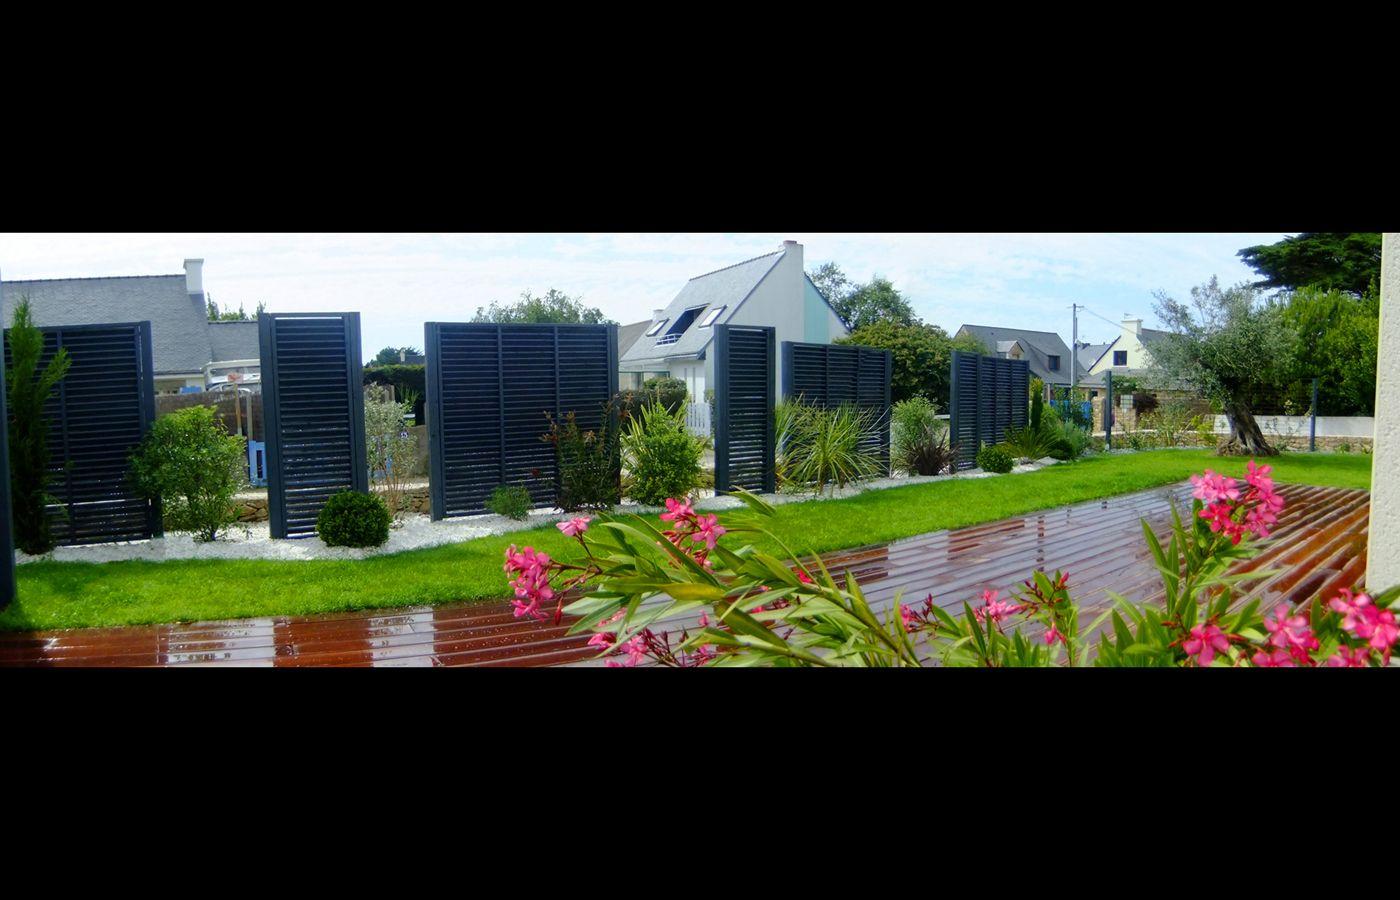 Cl ture en panneaux bois paysagiste jardins divers vannes for Paysagiste jardin moderne